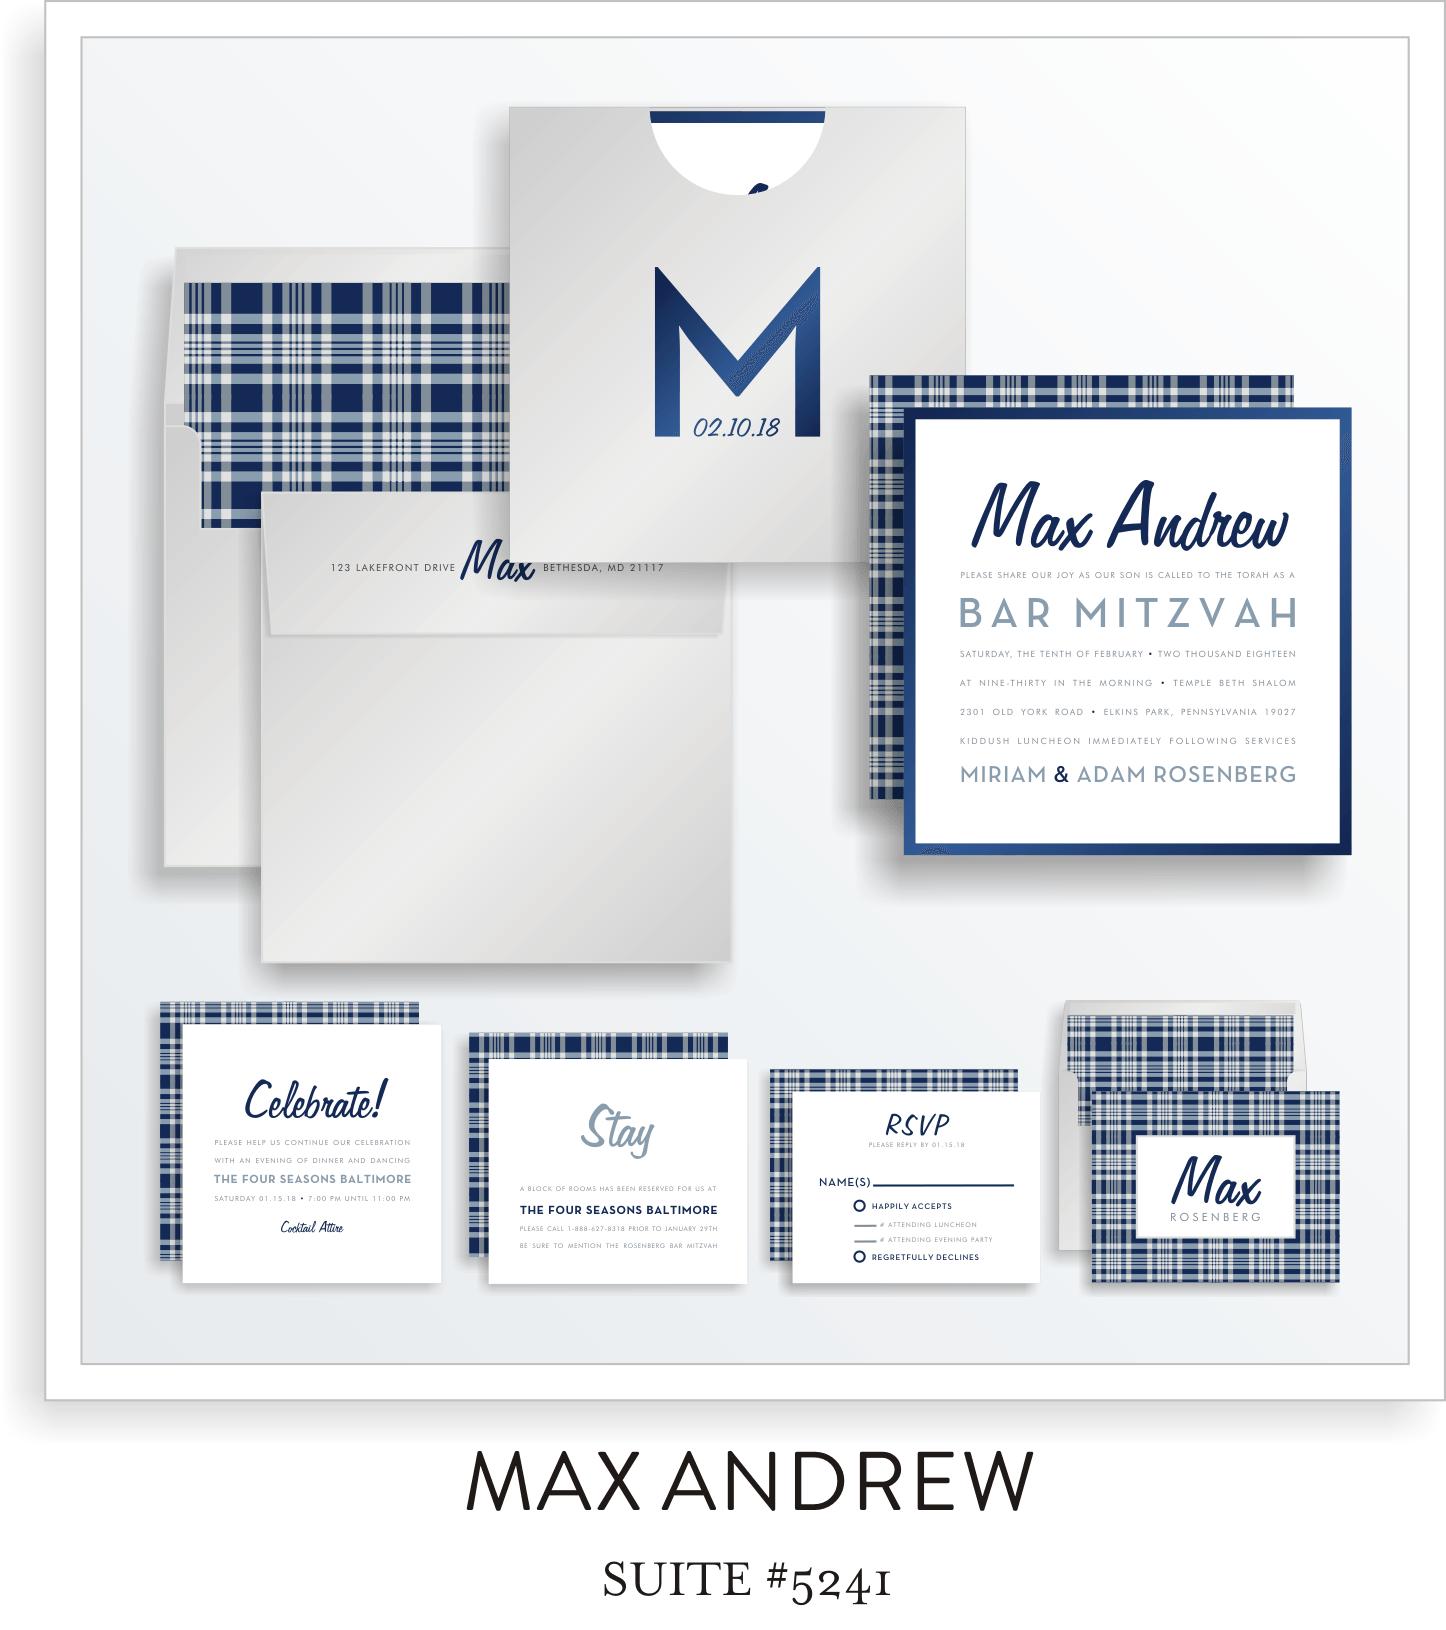 Copy of Copy of Bar Mitzvah Invitation Suite 5241 - Max Andrew